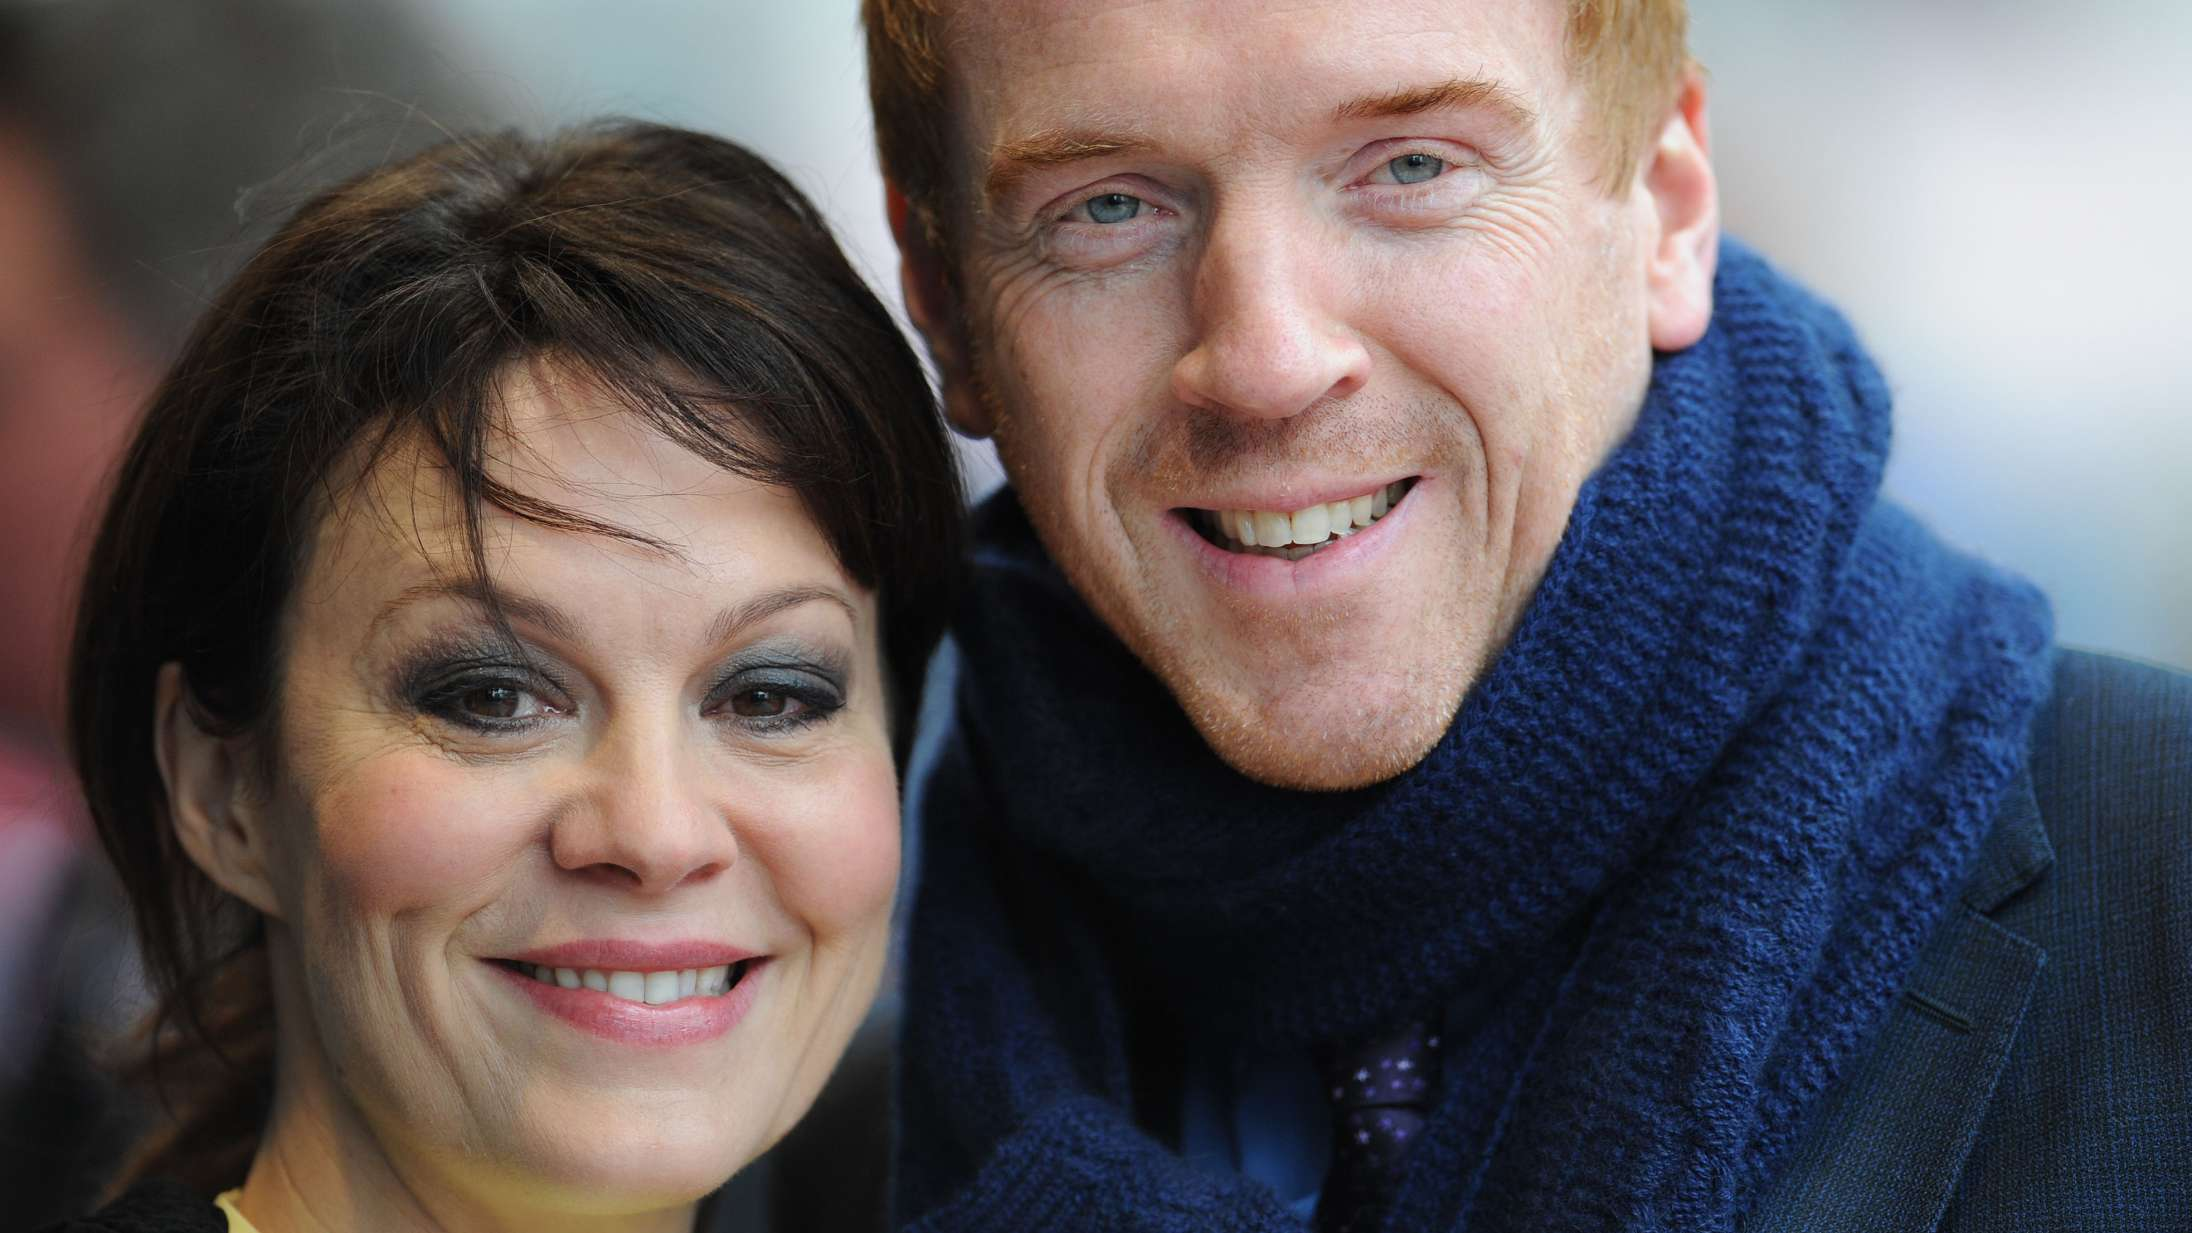 Damian Lewis hylder afdød hustru, 'Peaky Blinders'-stjerne Helen McCrory, med rørende kronik